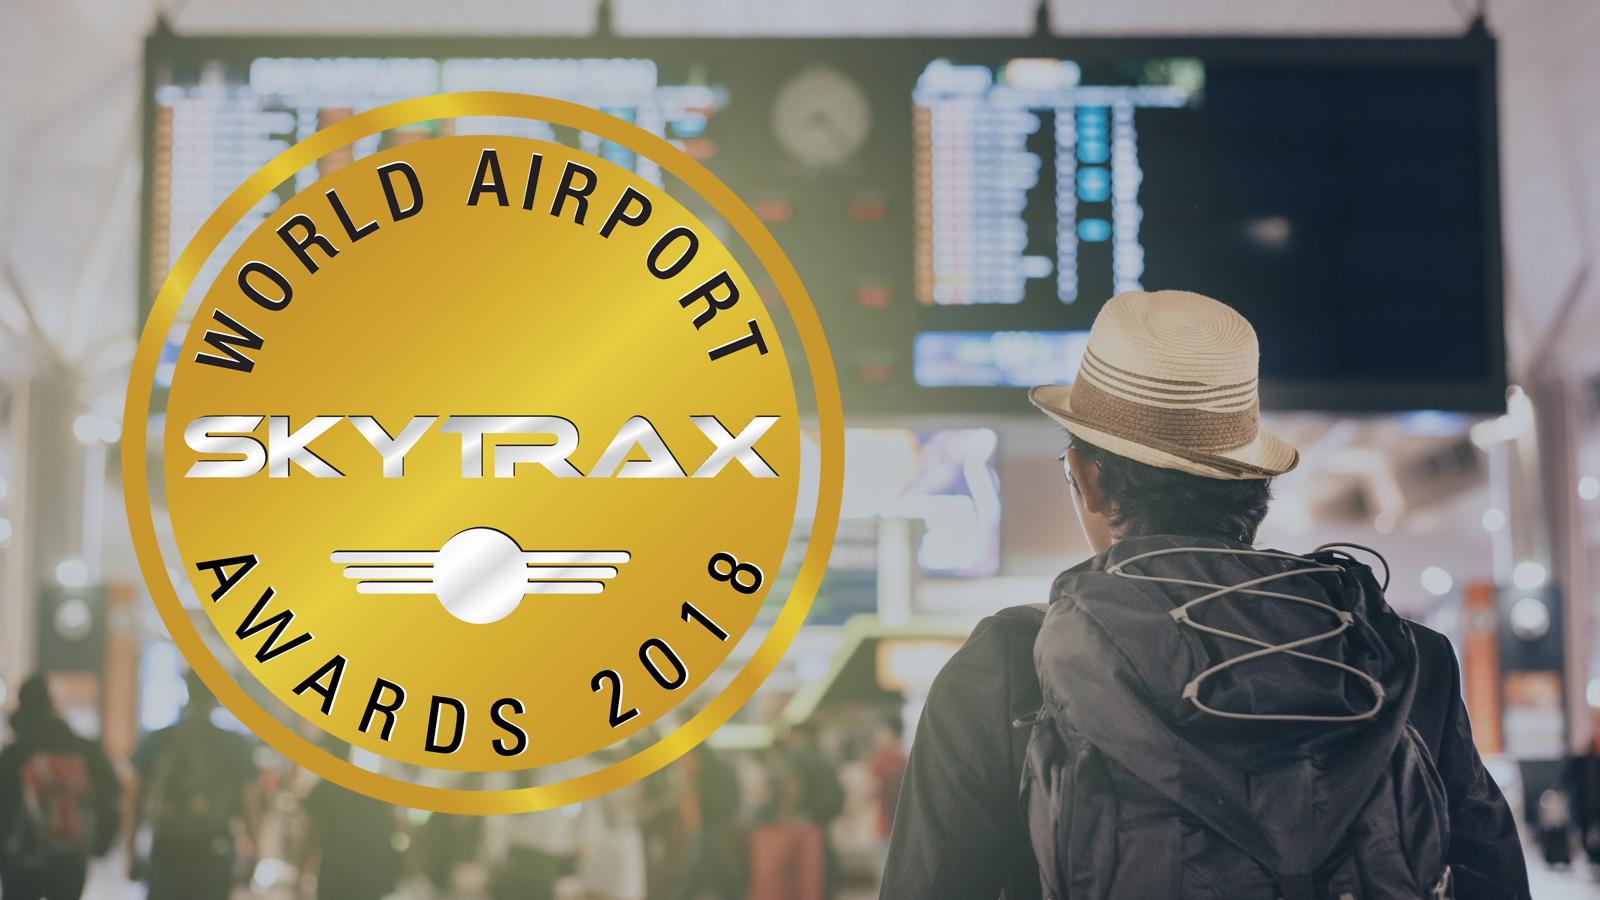 se anuncian los world airport awards 2018